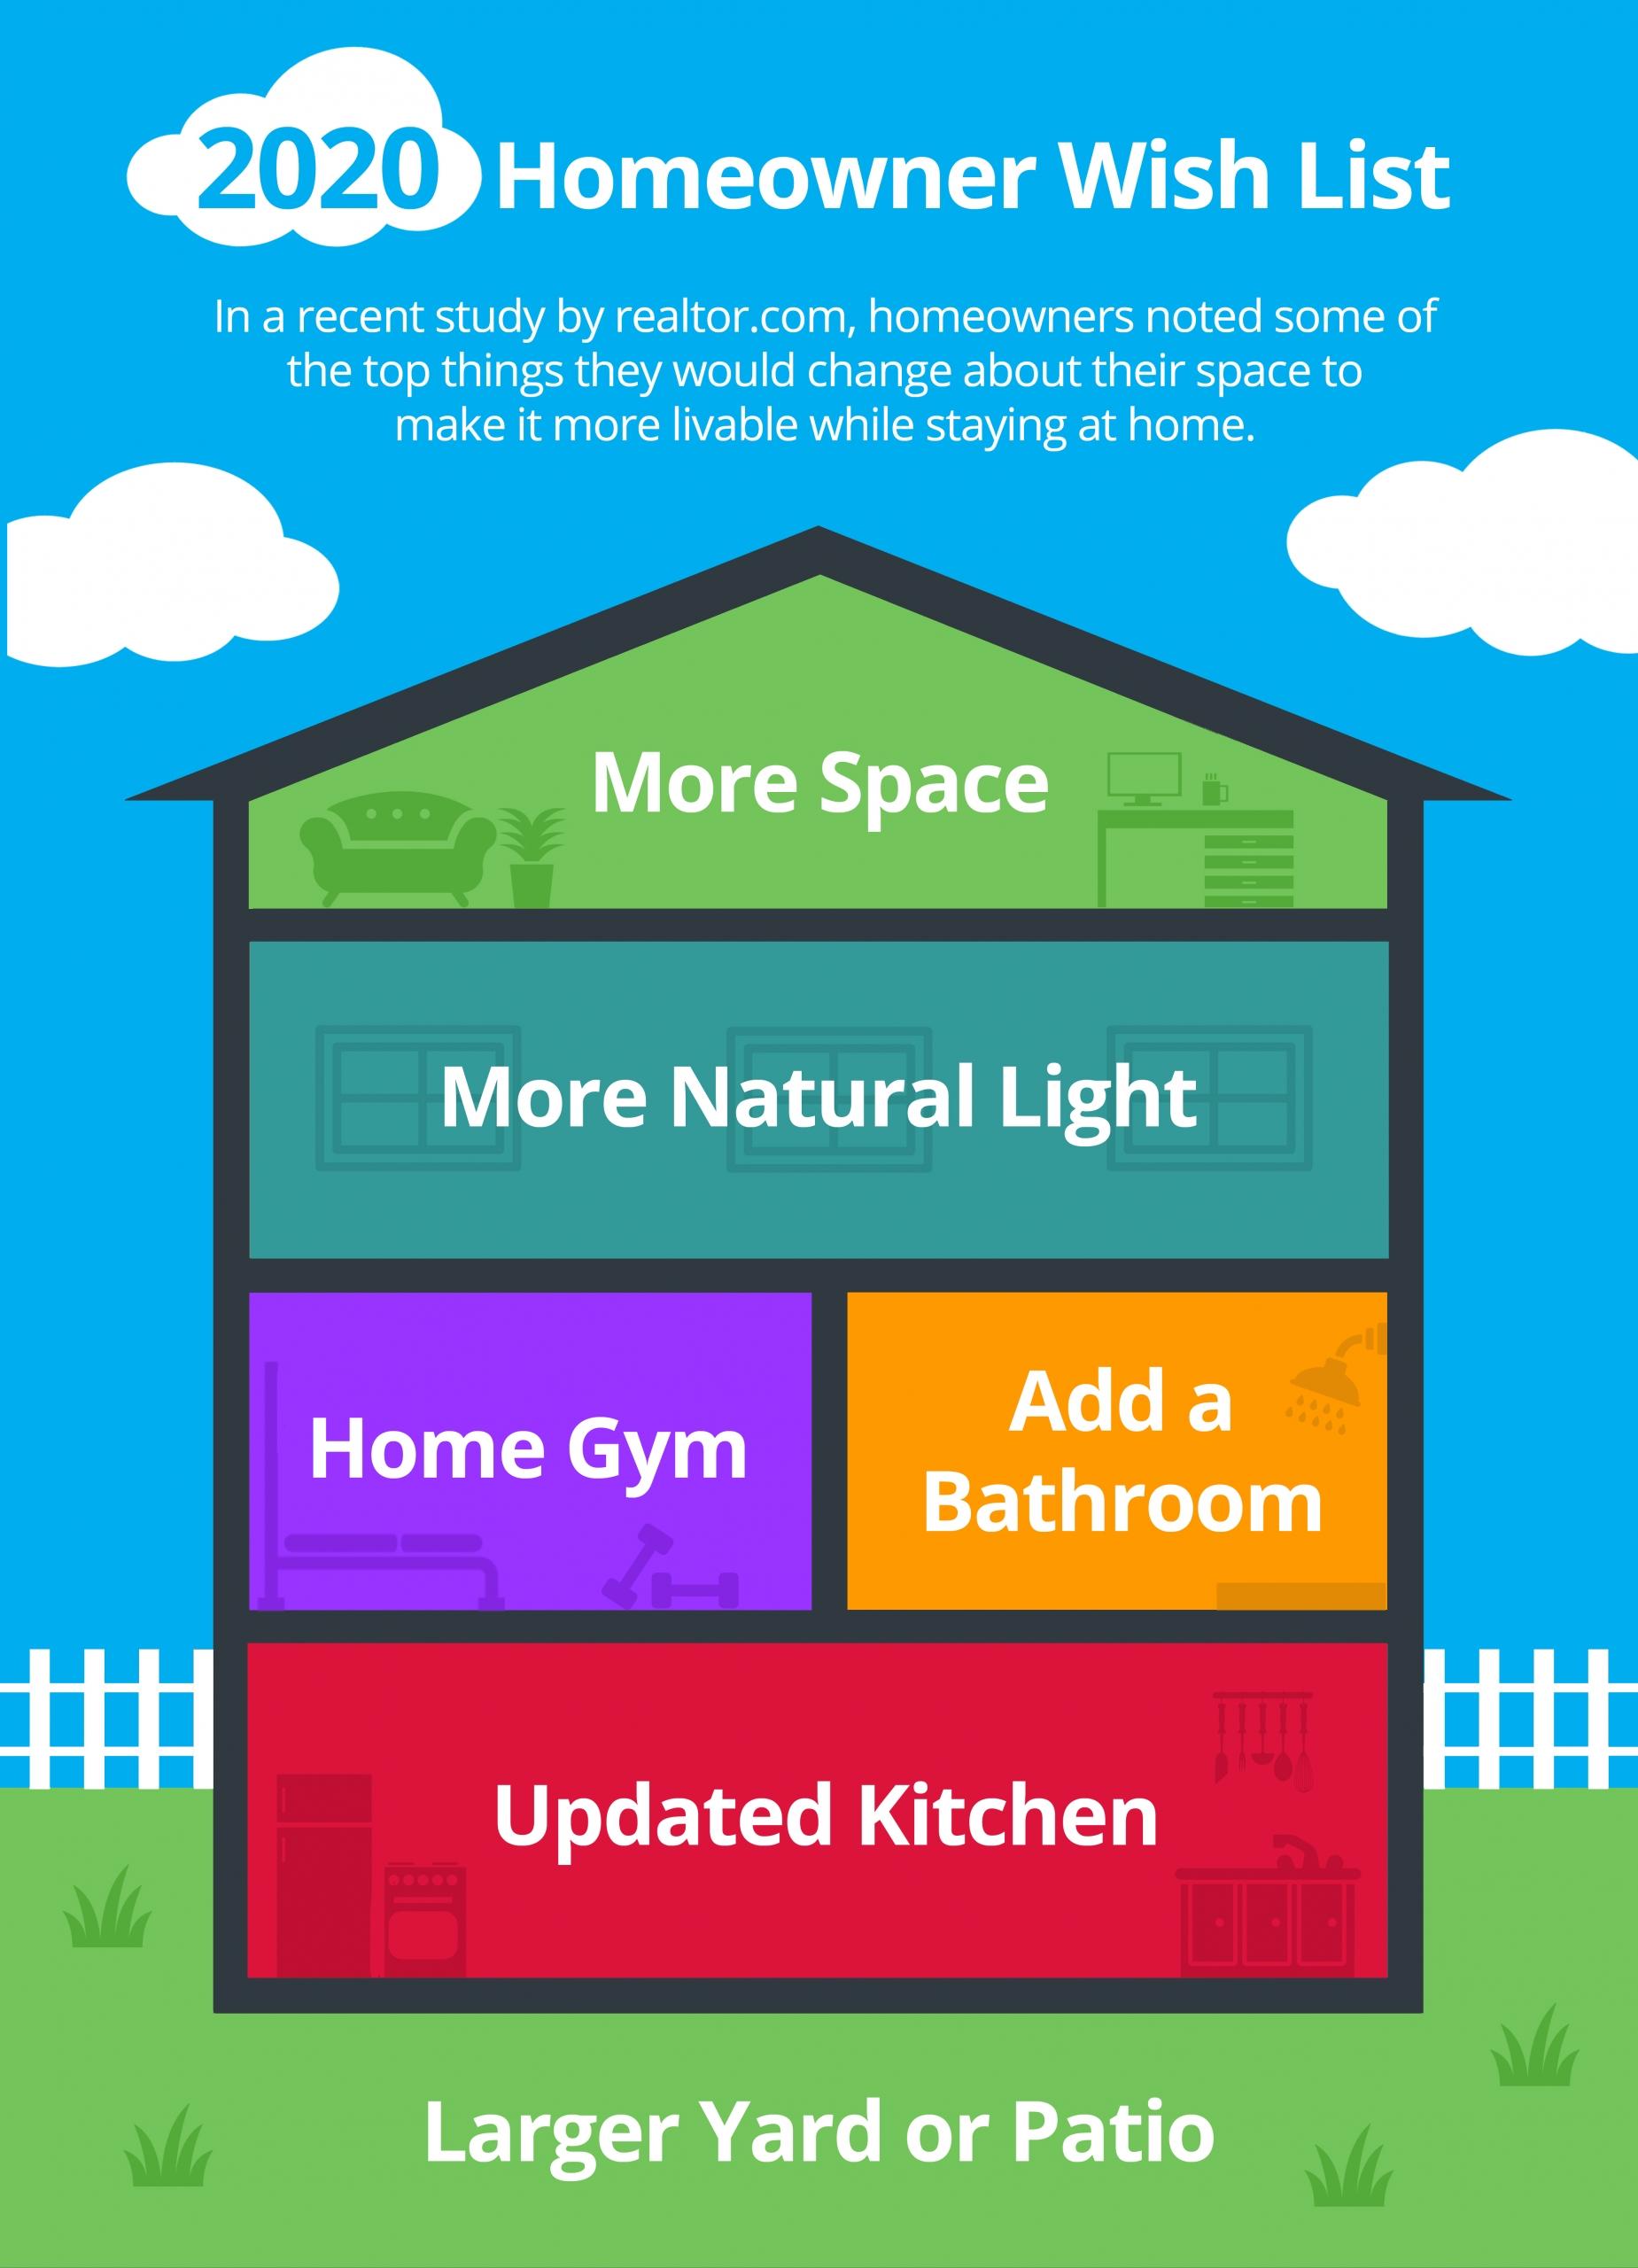 Kaye Swain Roseville REALTOR sharing 2020 Homeowner Wish List [INFOGRAPHIC]